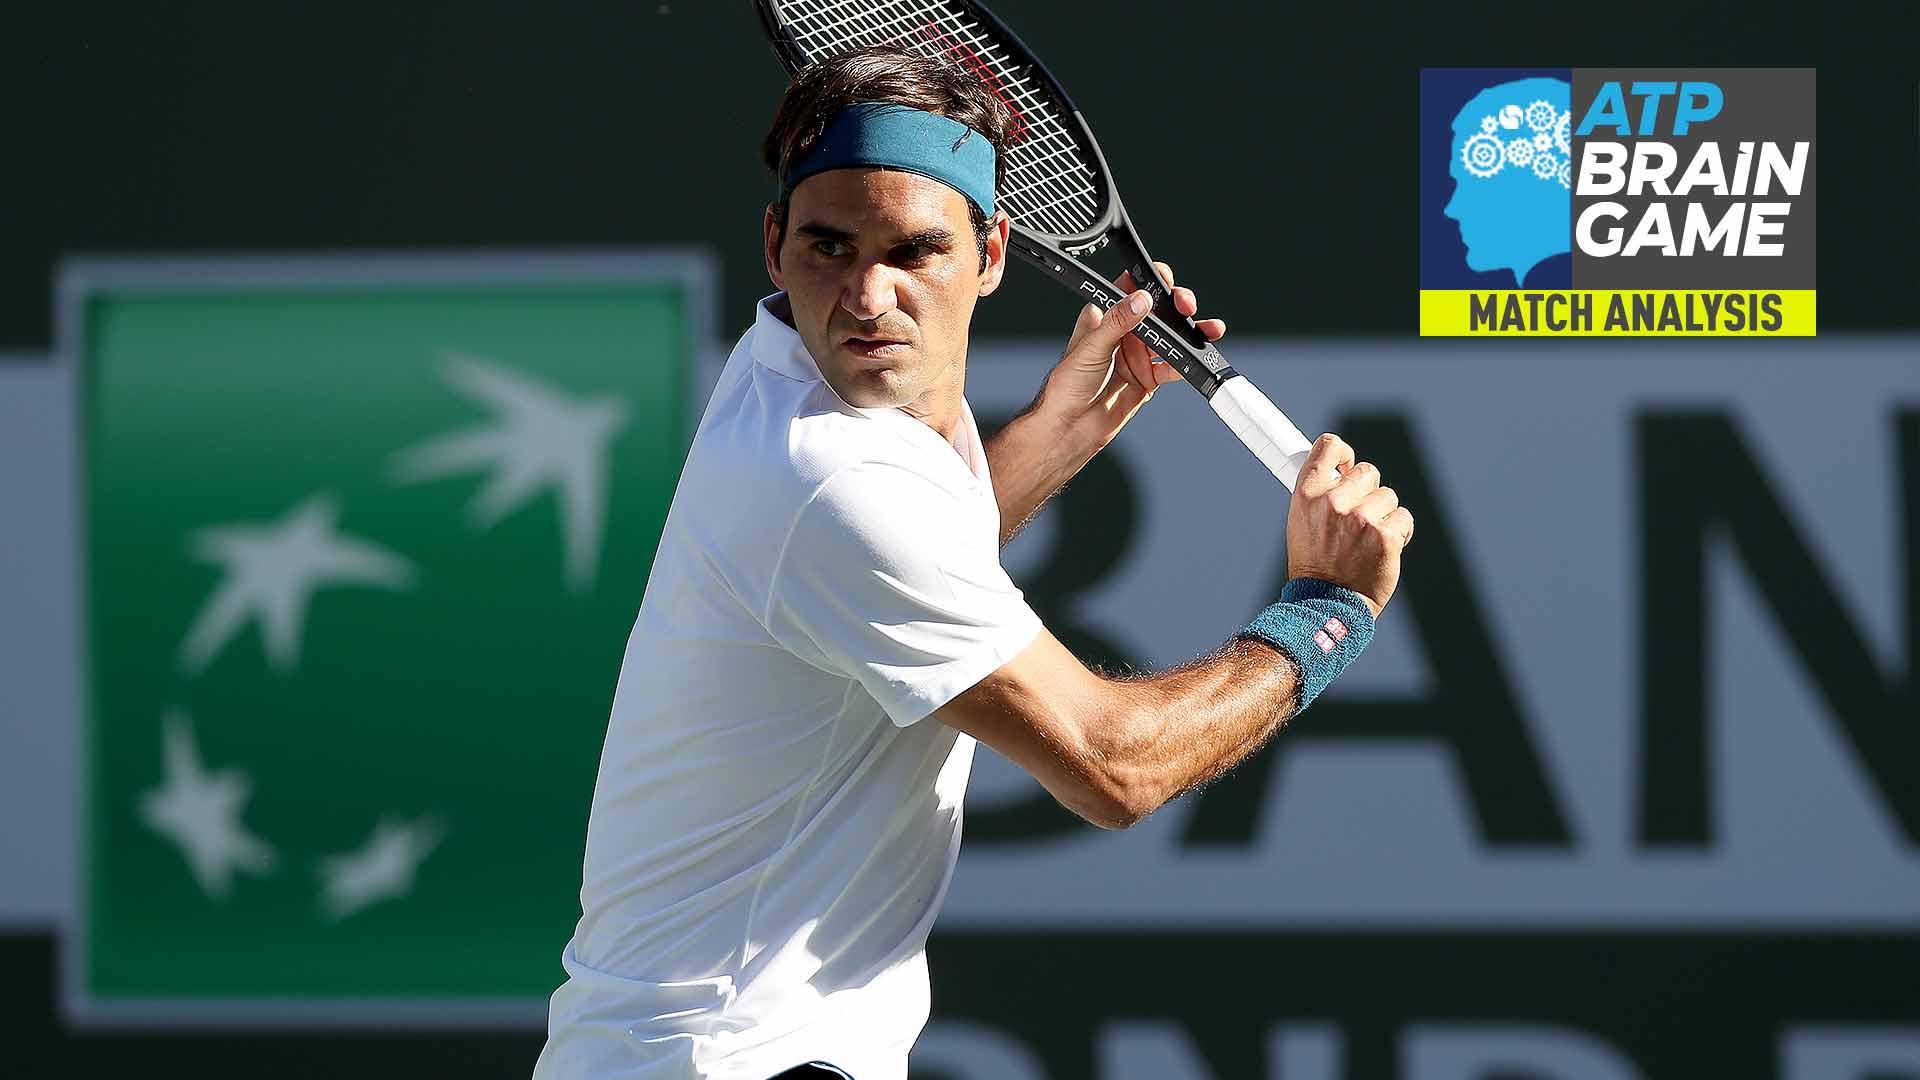 Roger Federer's Backhand Struggles Clear Way For Thiem Indian Wells   ATP Tour   Tennis